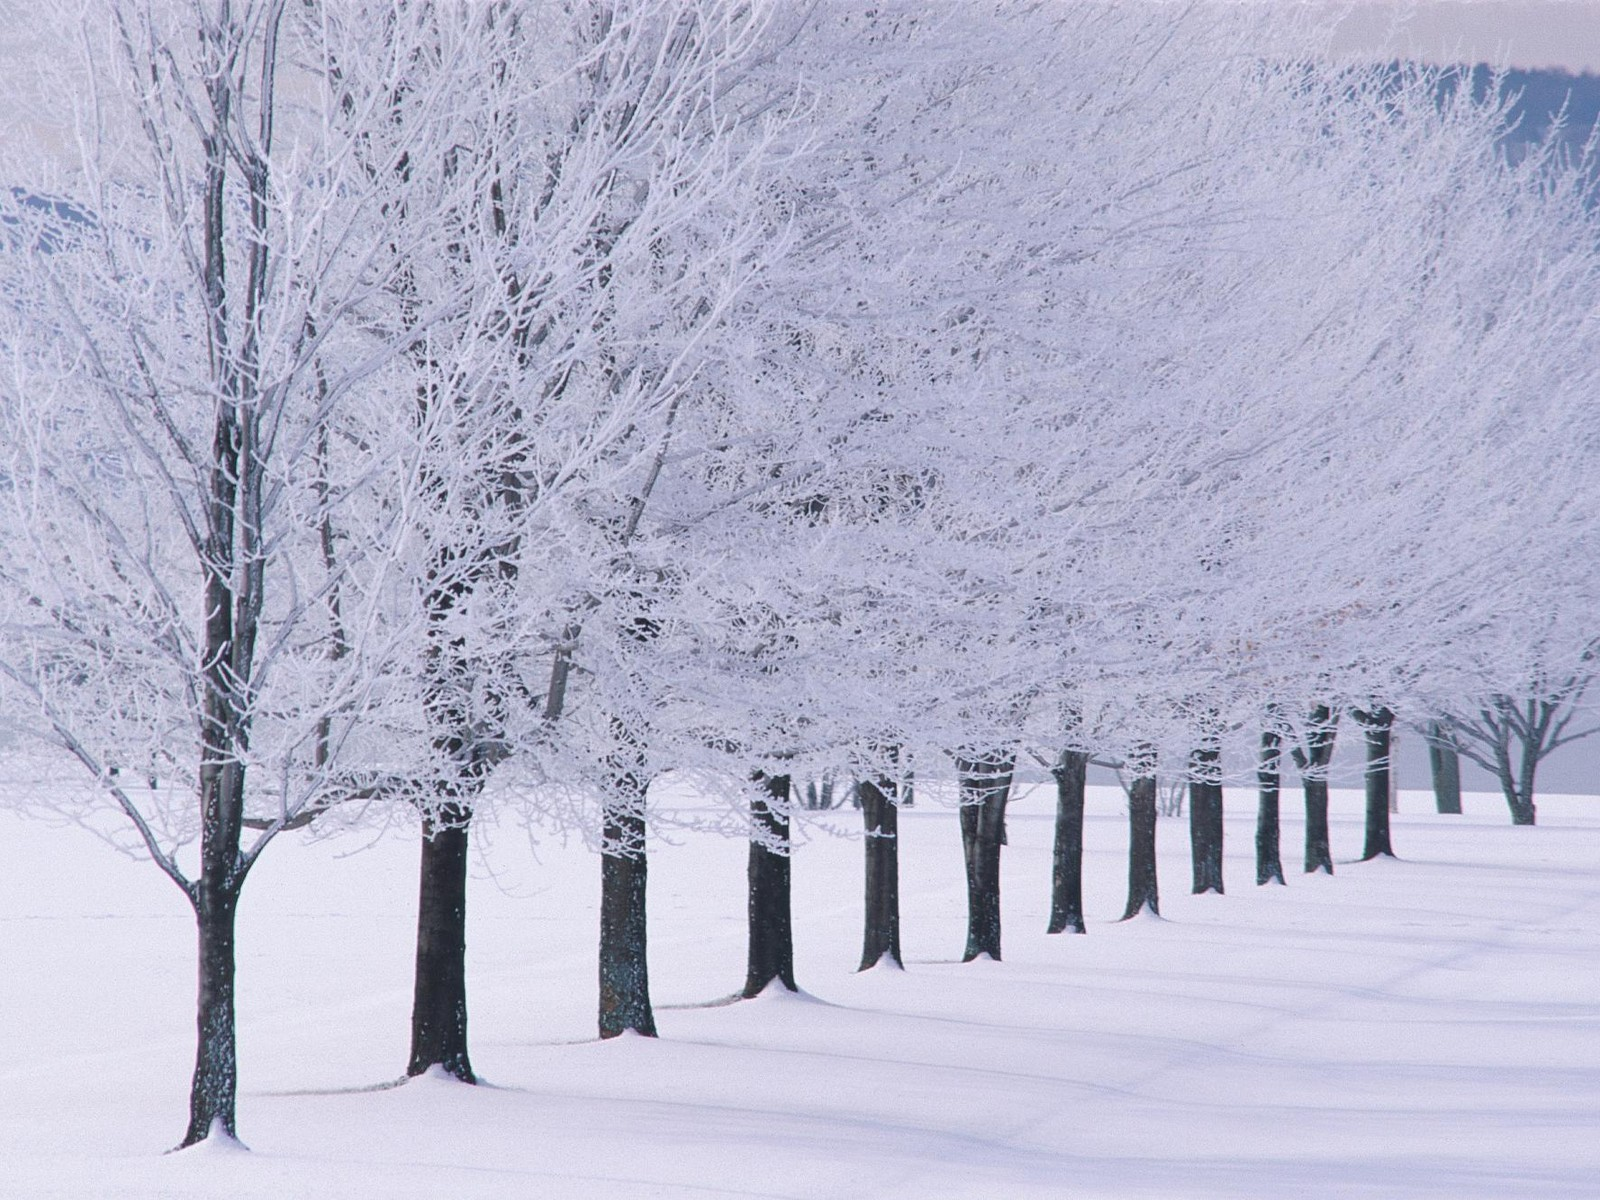 http://2.bp.blogspot.com/-UWgr2fipsdU/T6s2alGCT2I/AAAAAAAAE4k/KKgSpTcYshg/s1600/winter%2Bwallpaper%2B04.jpg